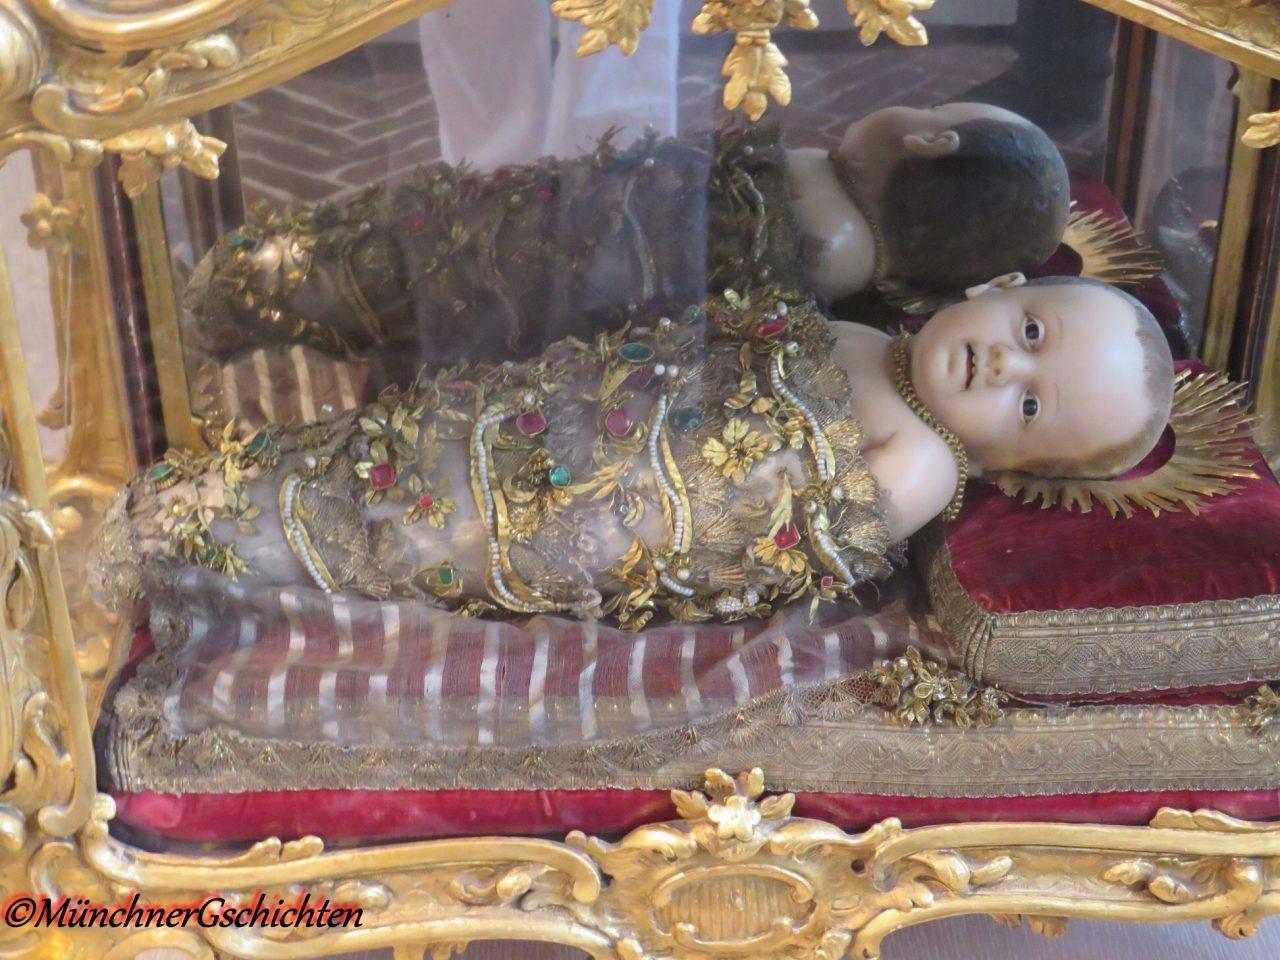 Munich Christmas miracle, Baby Jesus